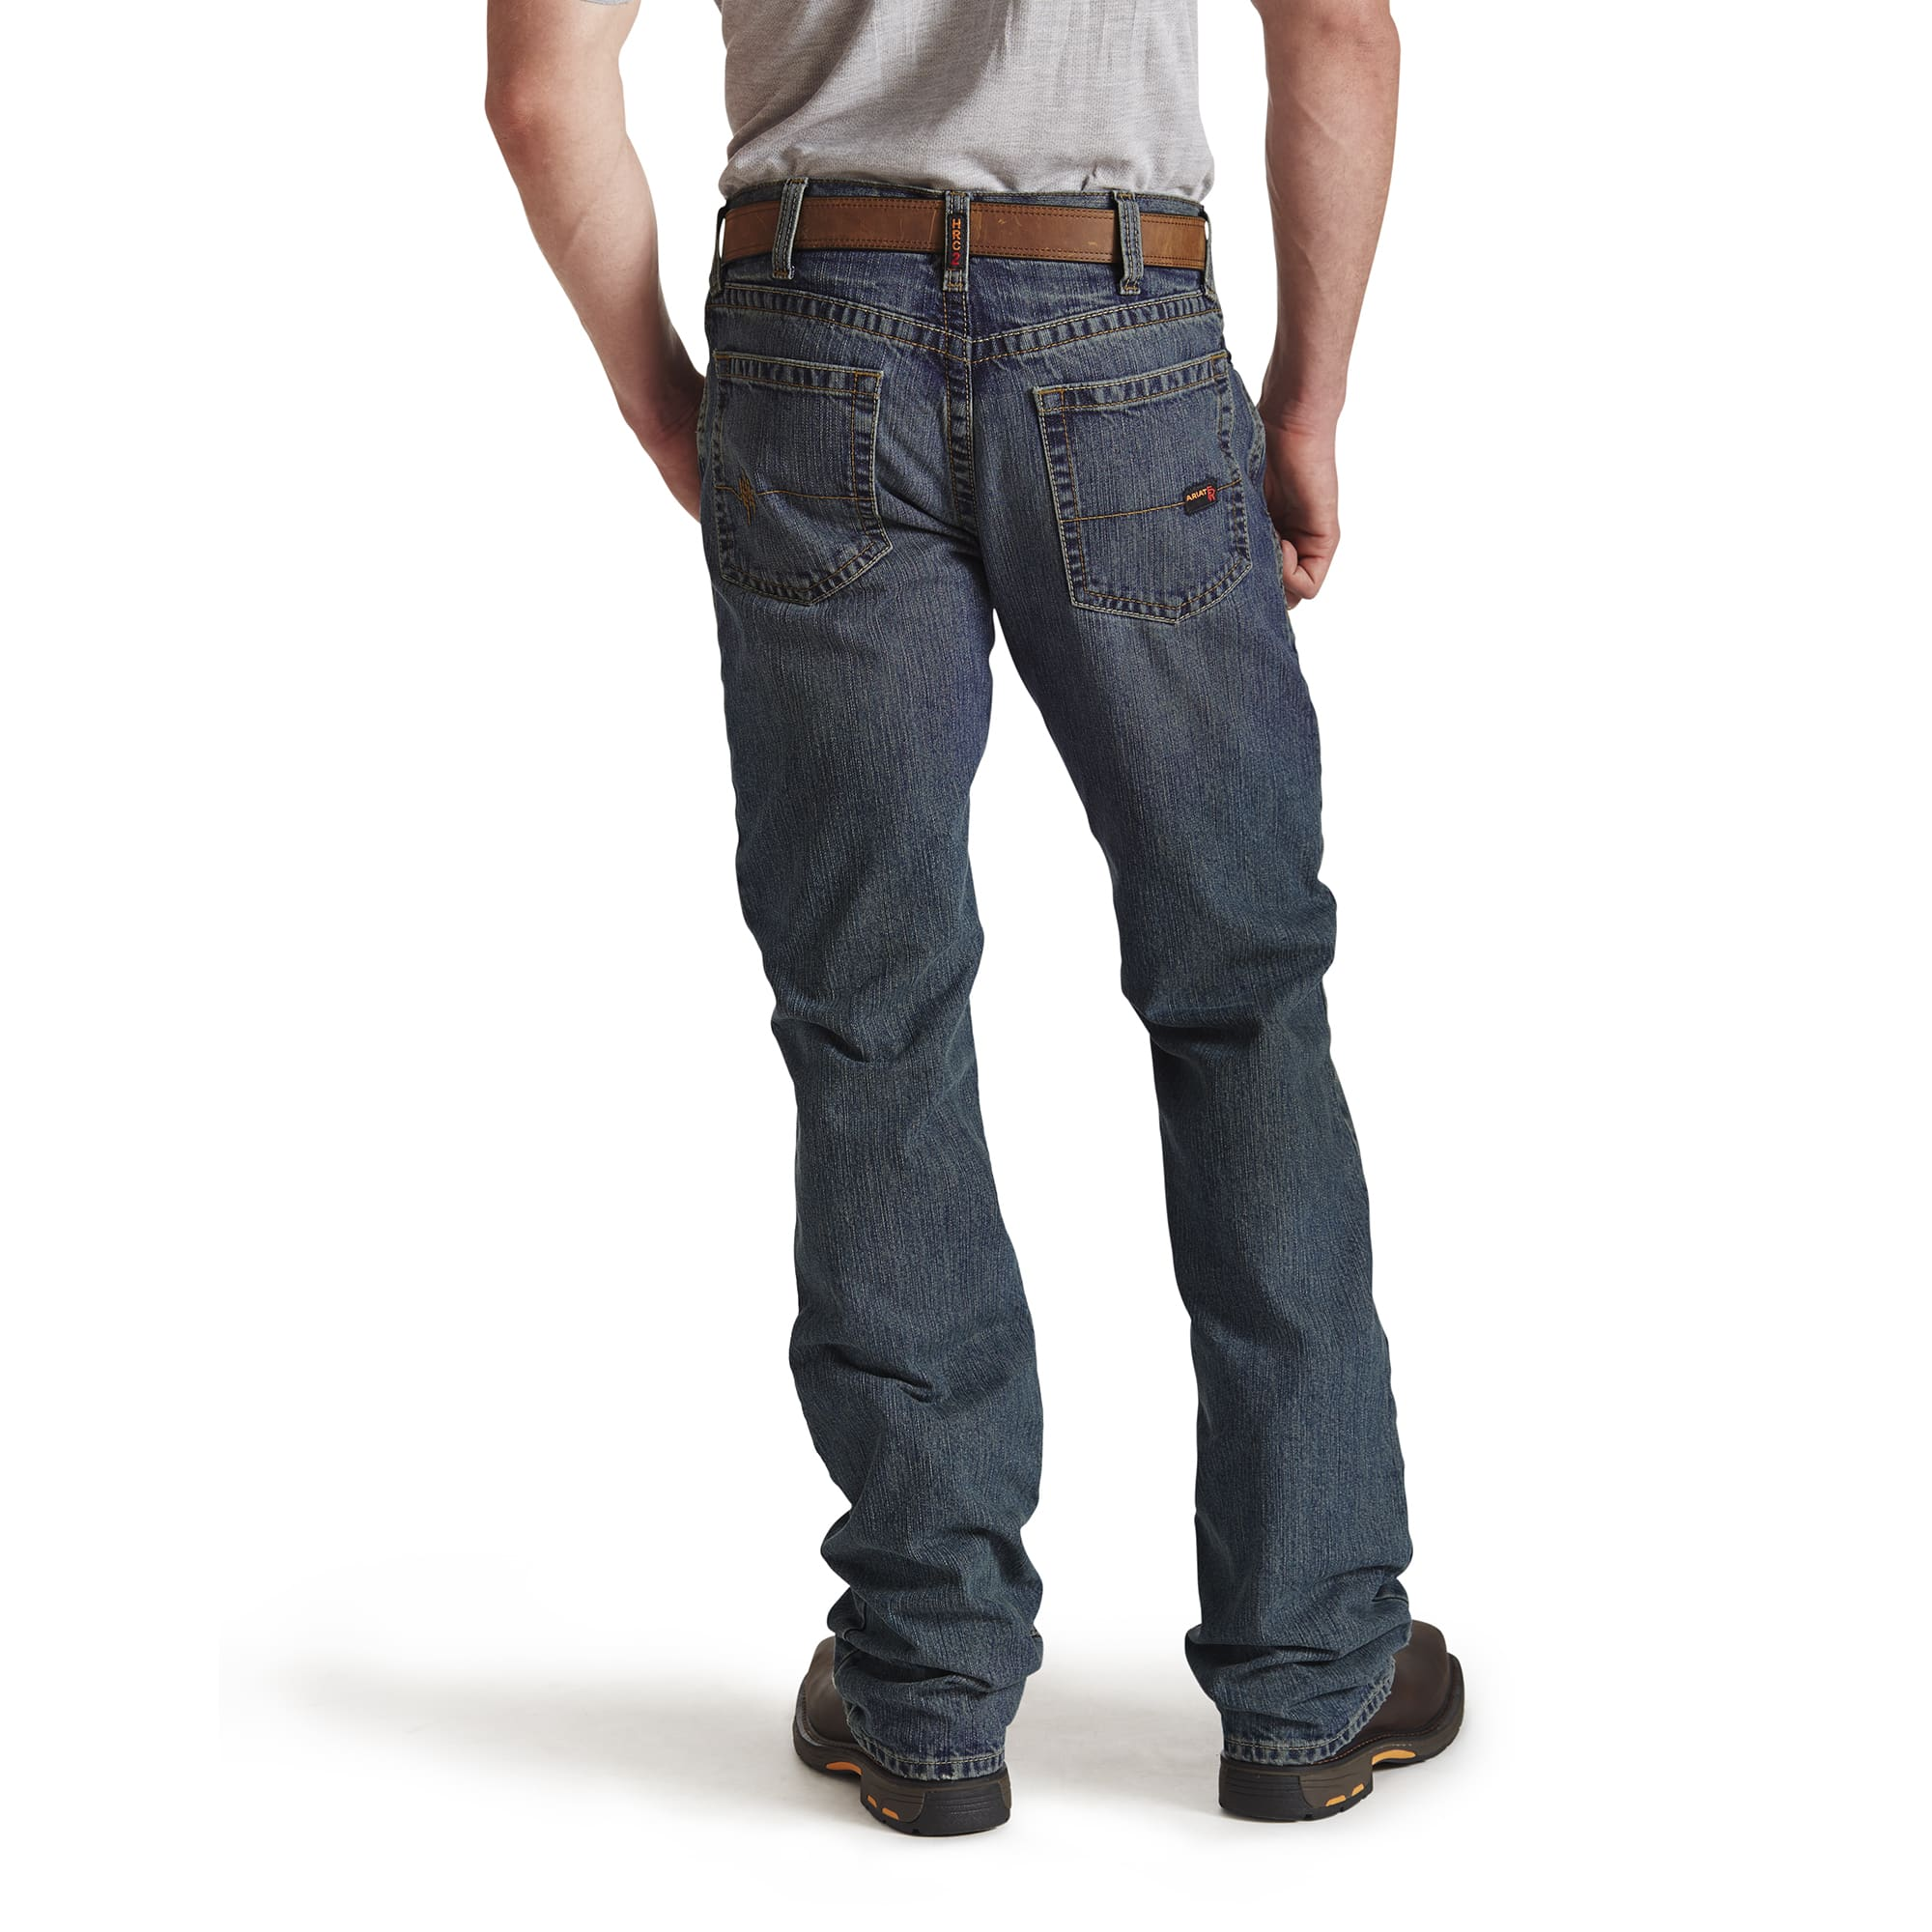 4949ebcf91a ... Ariat FR M5 Shale Slim Fit Men s Straight Leg ...